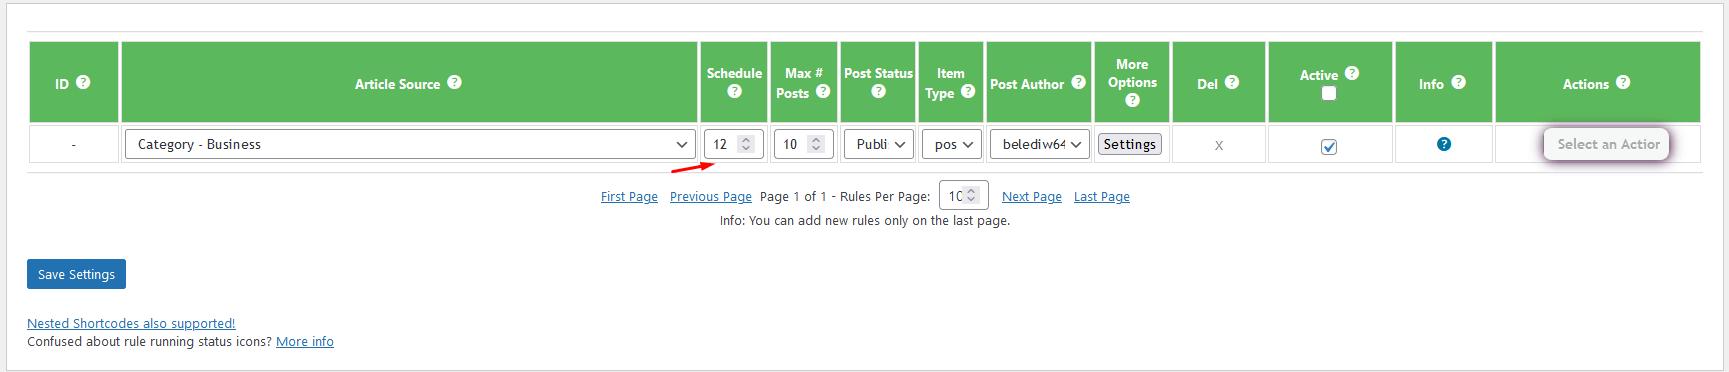 Add custom news posts - 4